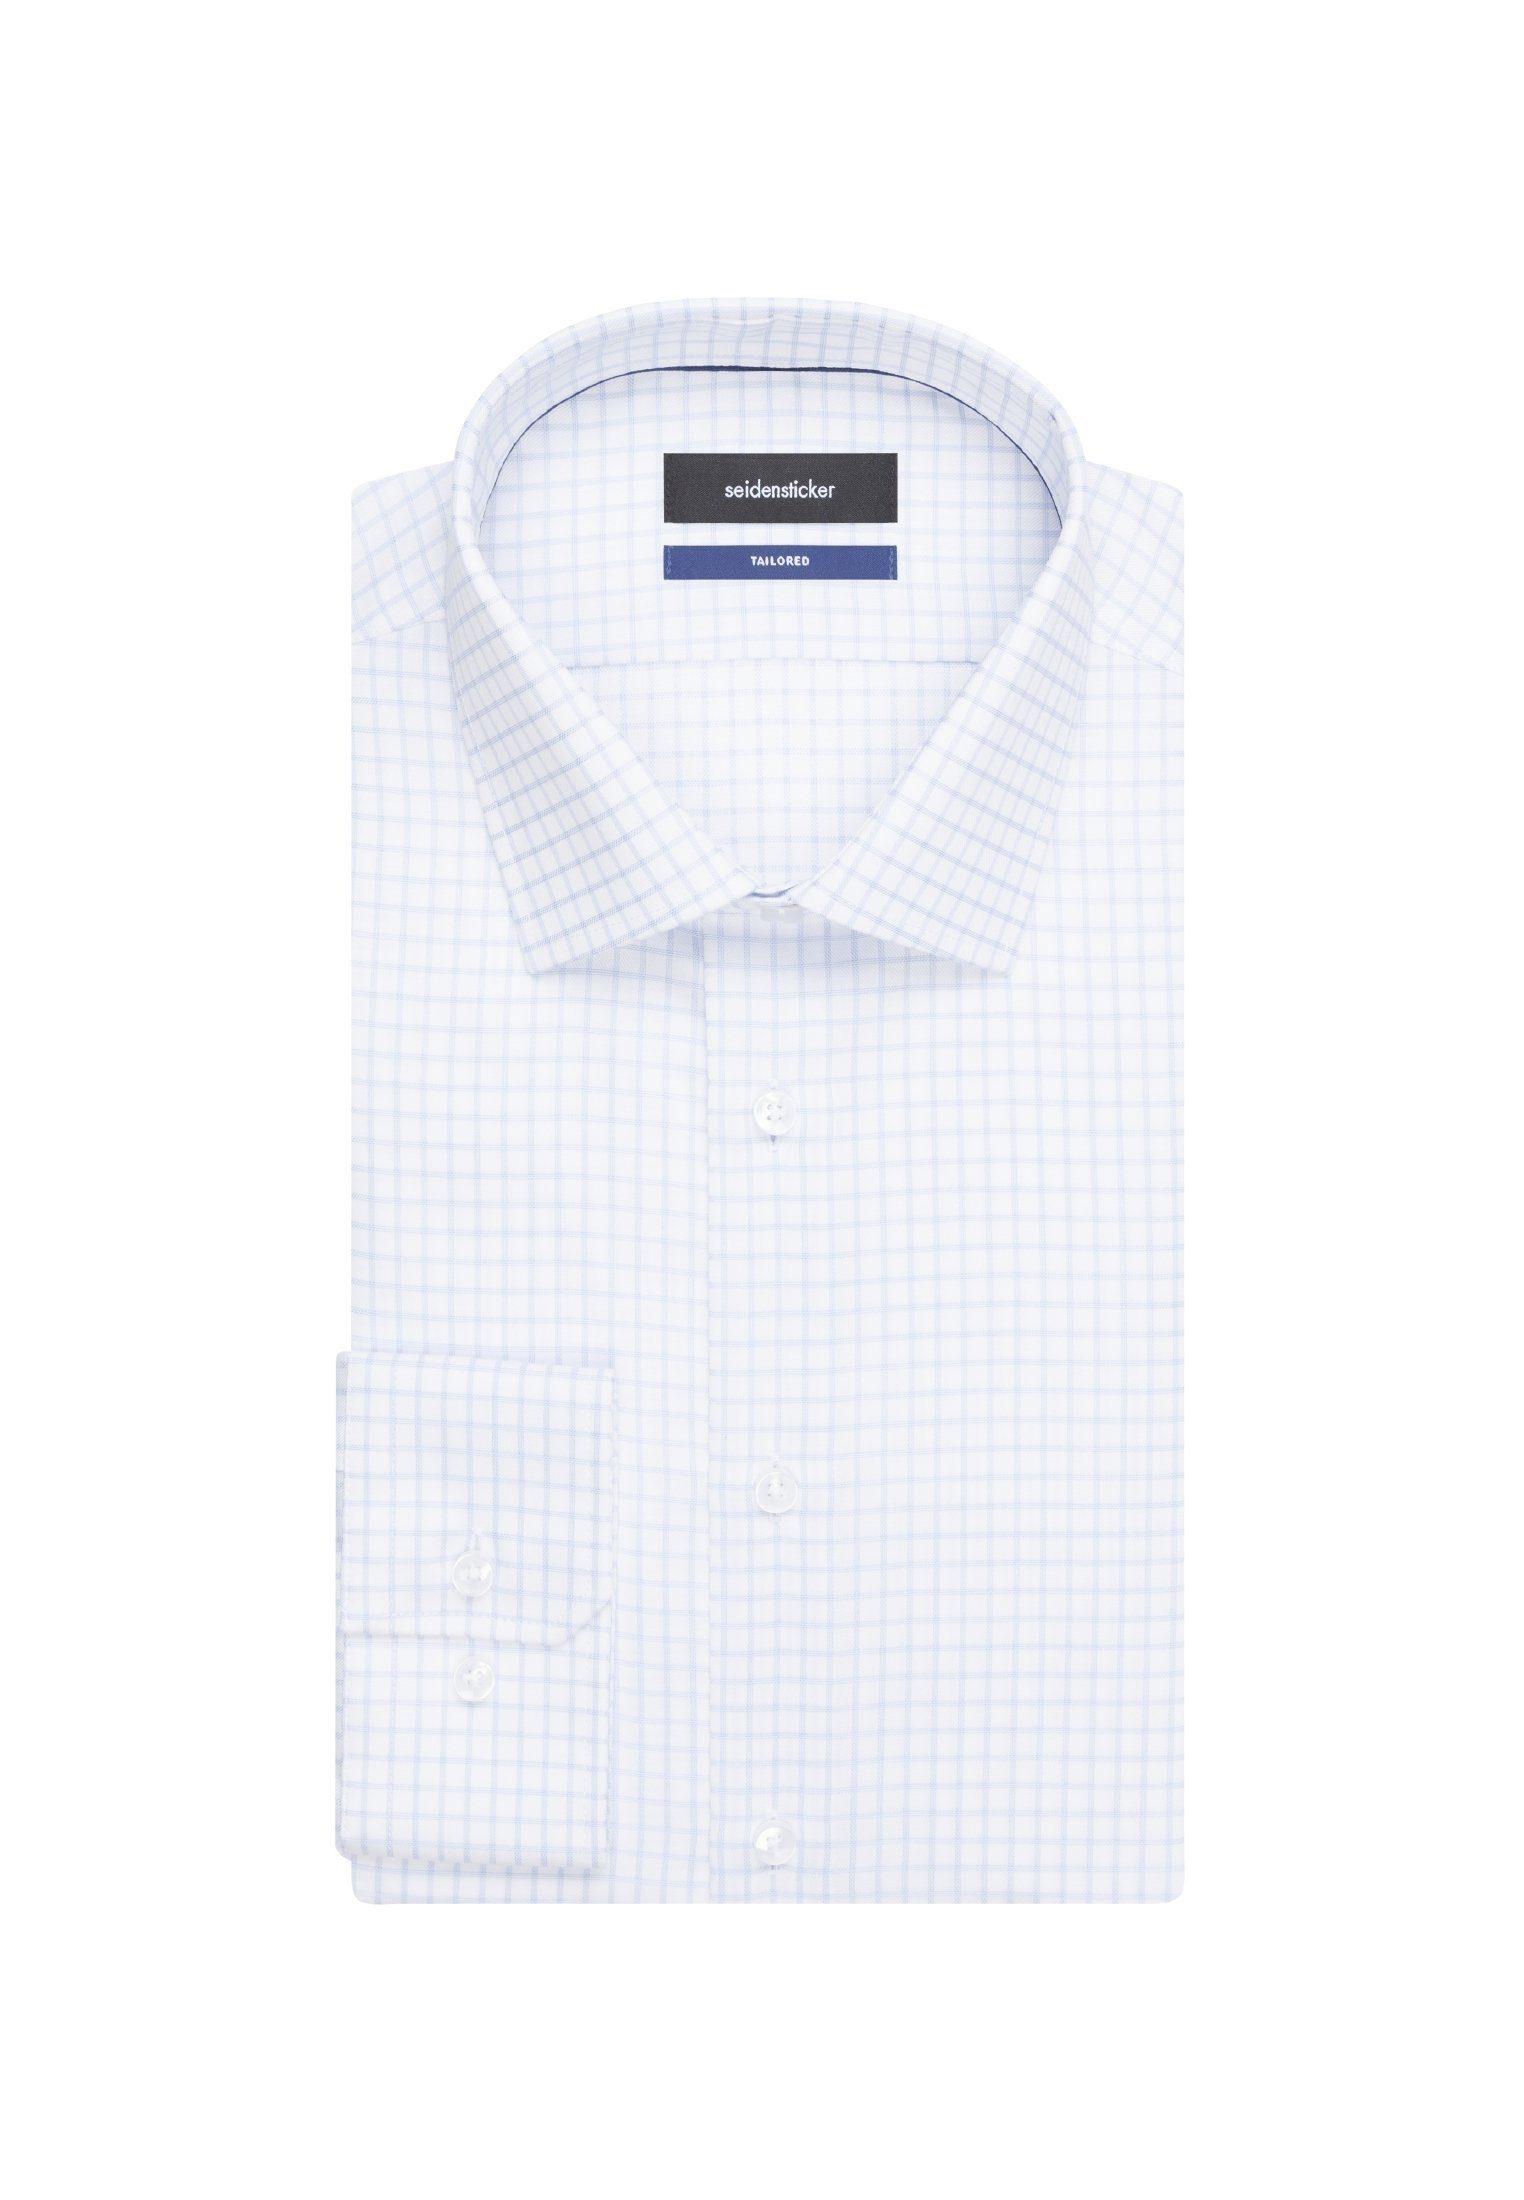 Online Seidensticker Kentkragen Businesshemd »tailored« Langarm Kaufen Tailored Karo fvyI6mYb7g